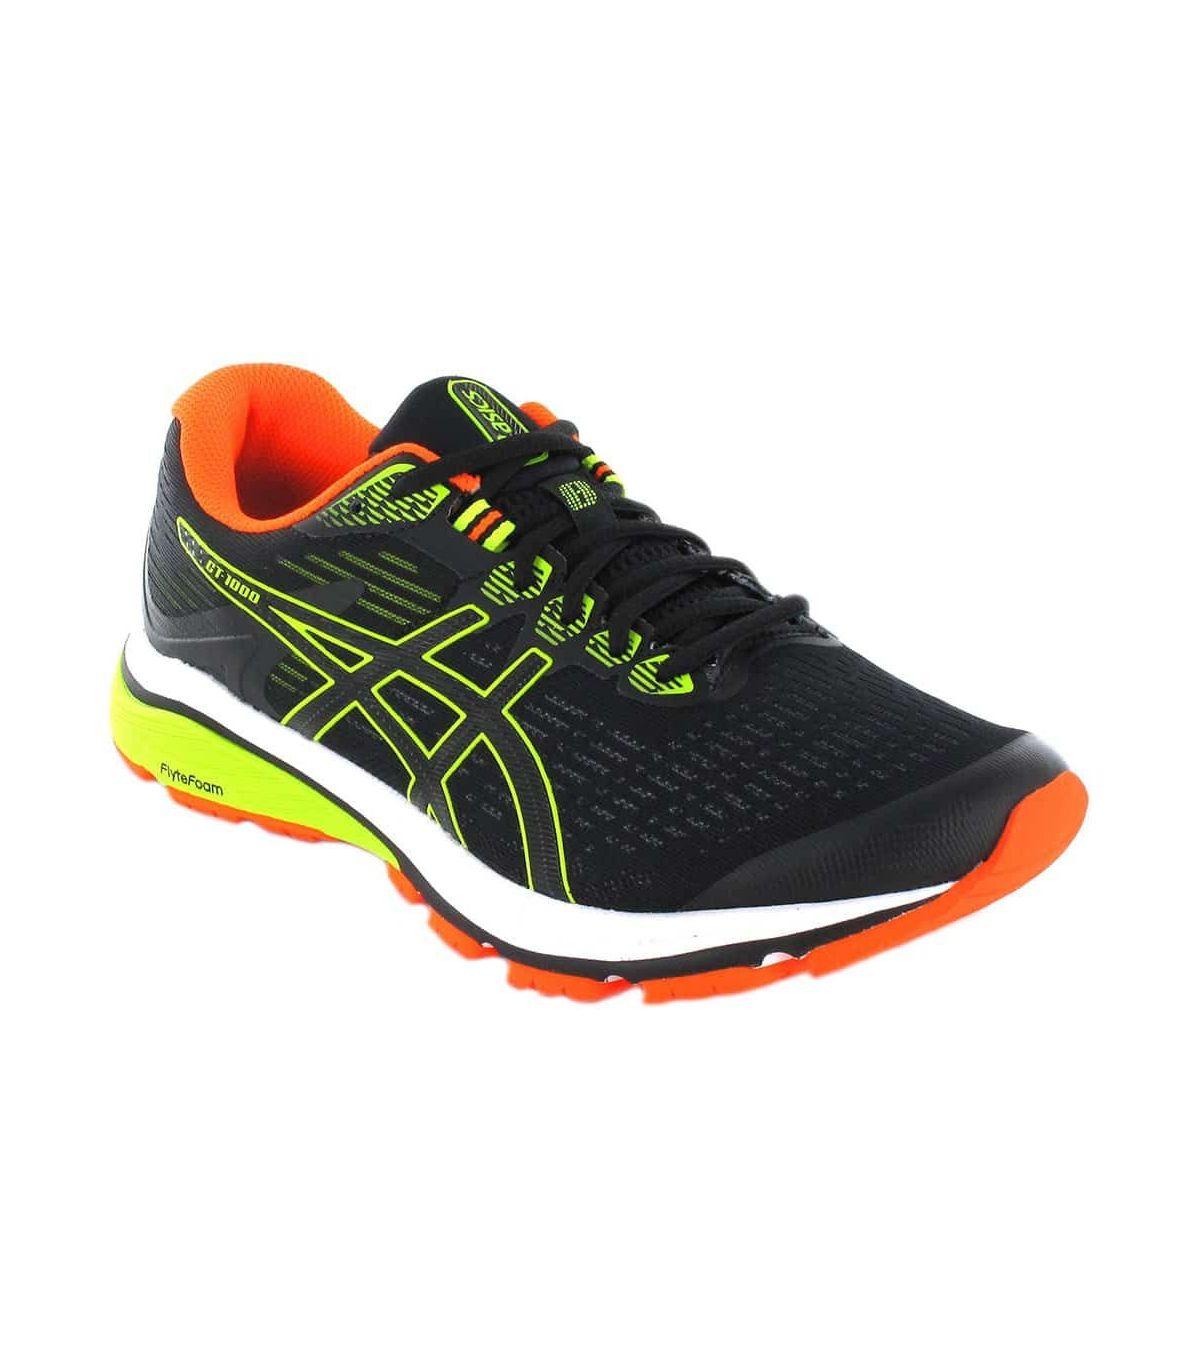 Asics GT 1000 8 Asics Chaussures de Course de Mens Chaussures de course Running Tailles: 41,5, 42, 42,5, 43,5, 44, 44,5, 45, 46